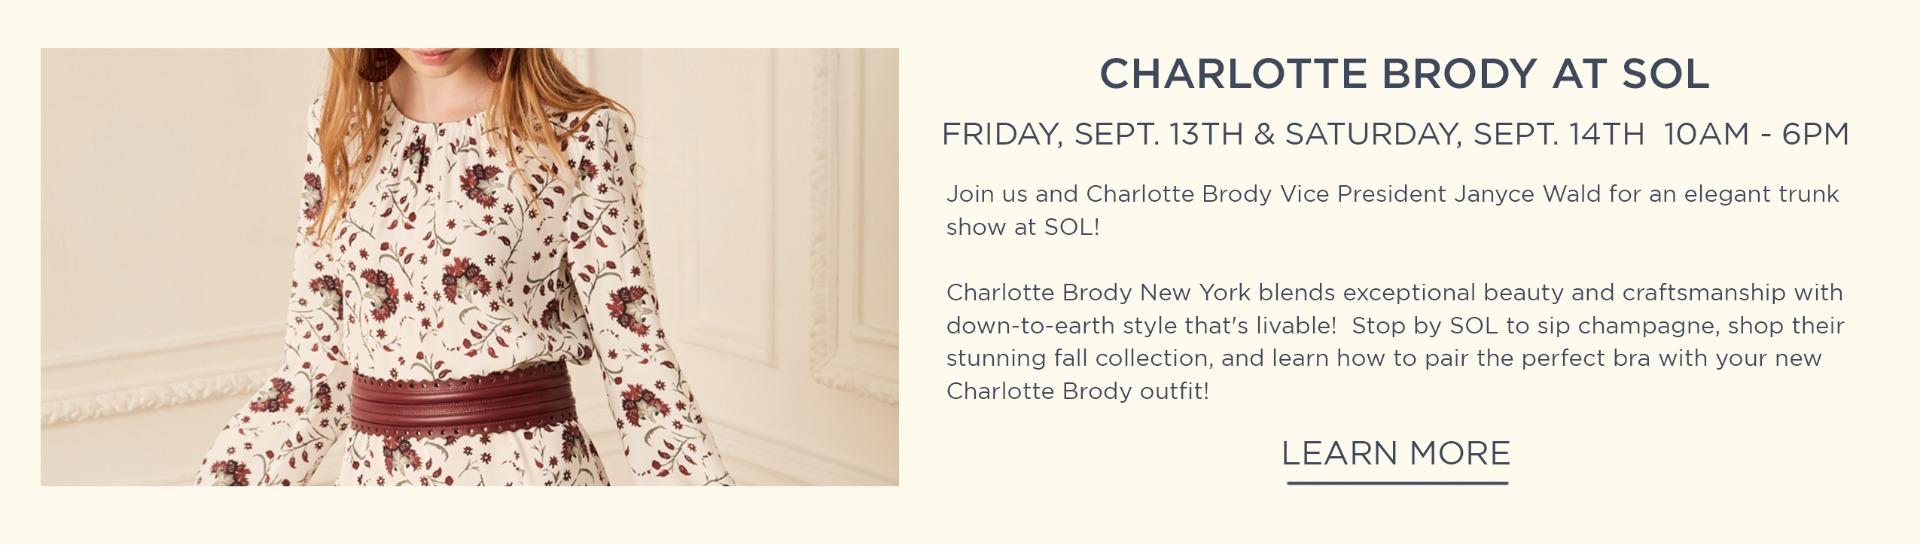 Charlotte Brody at SOL